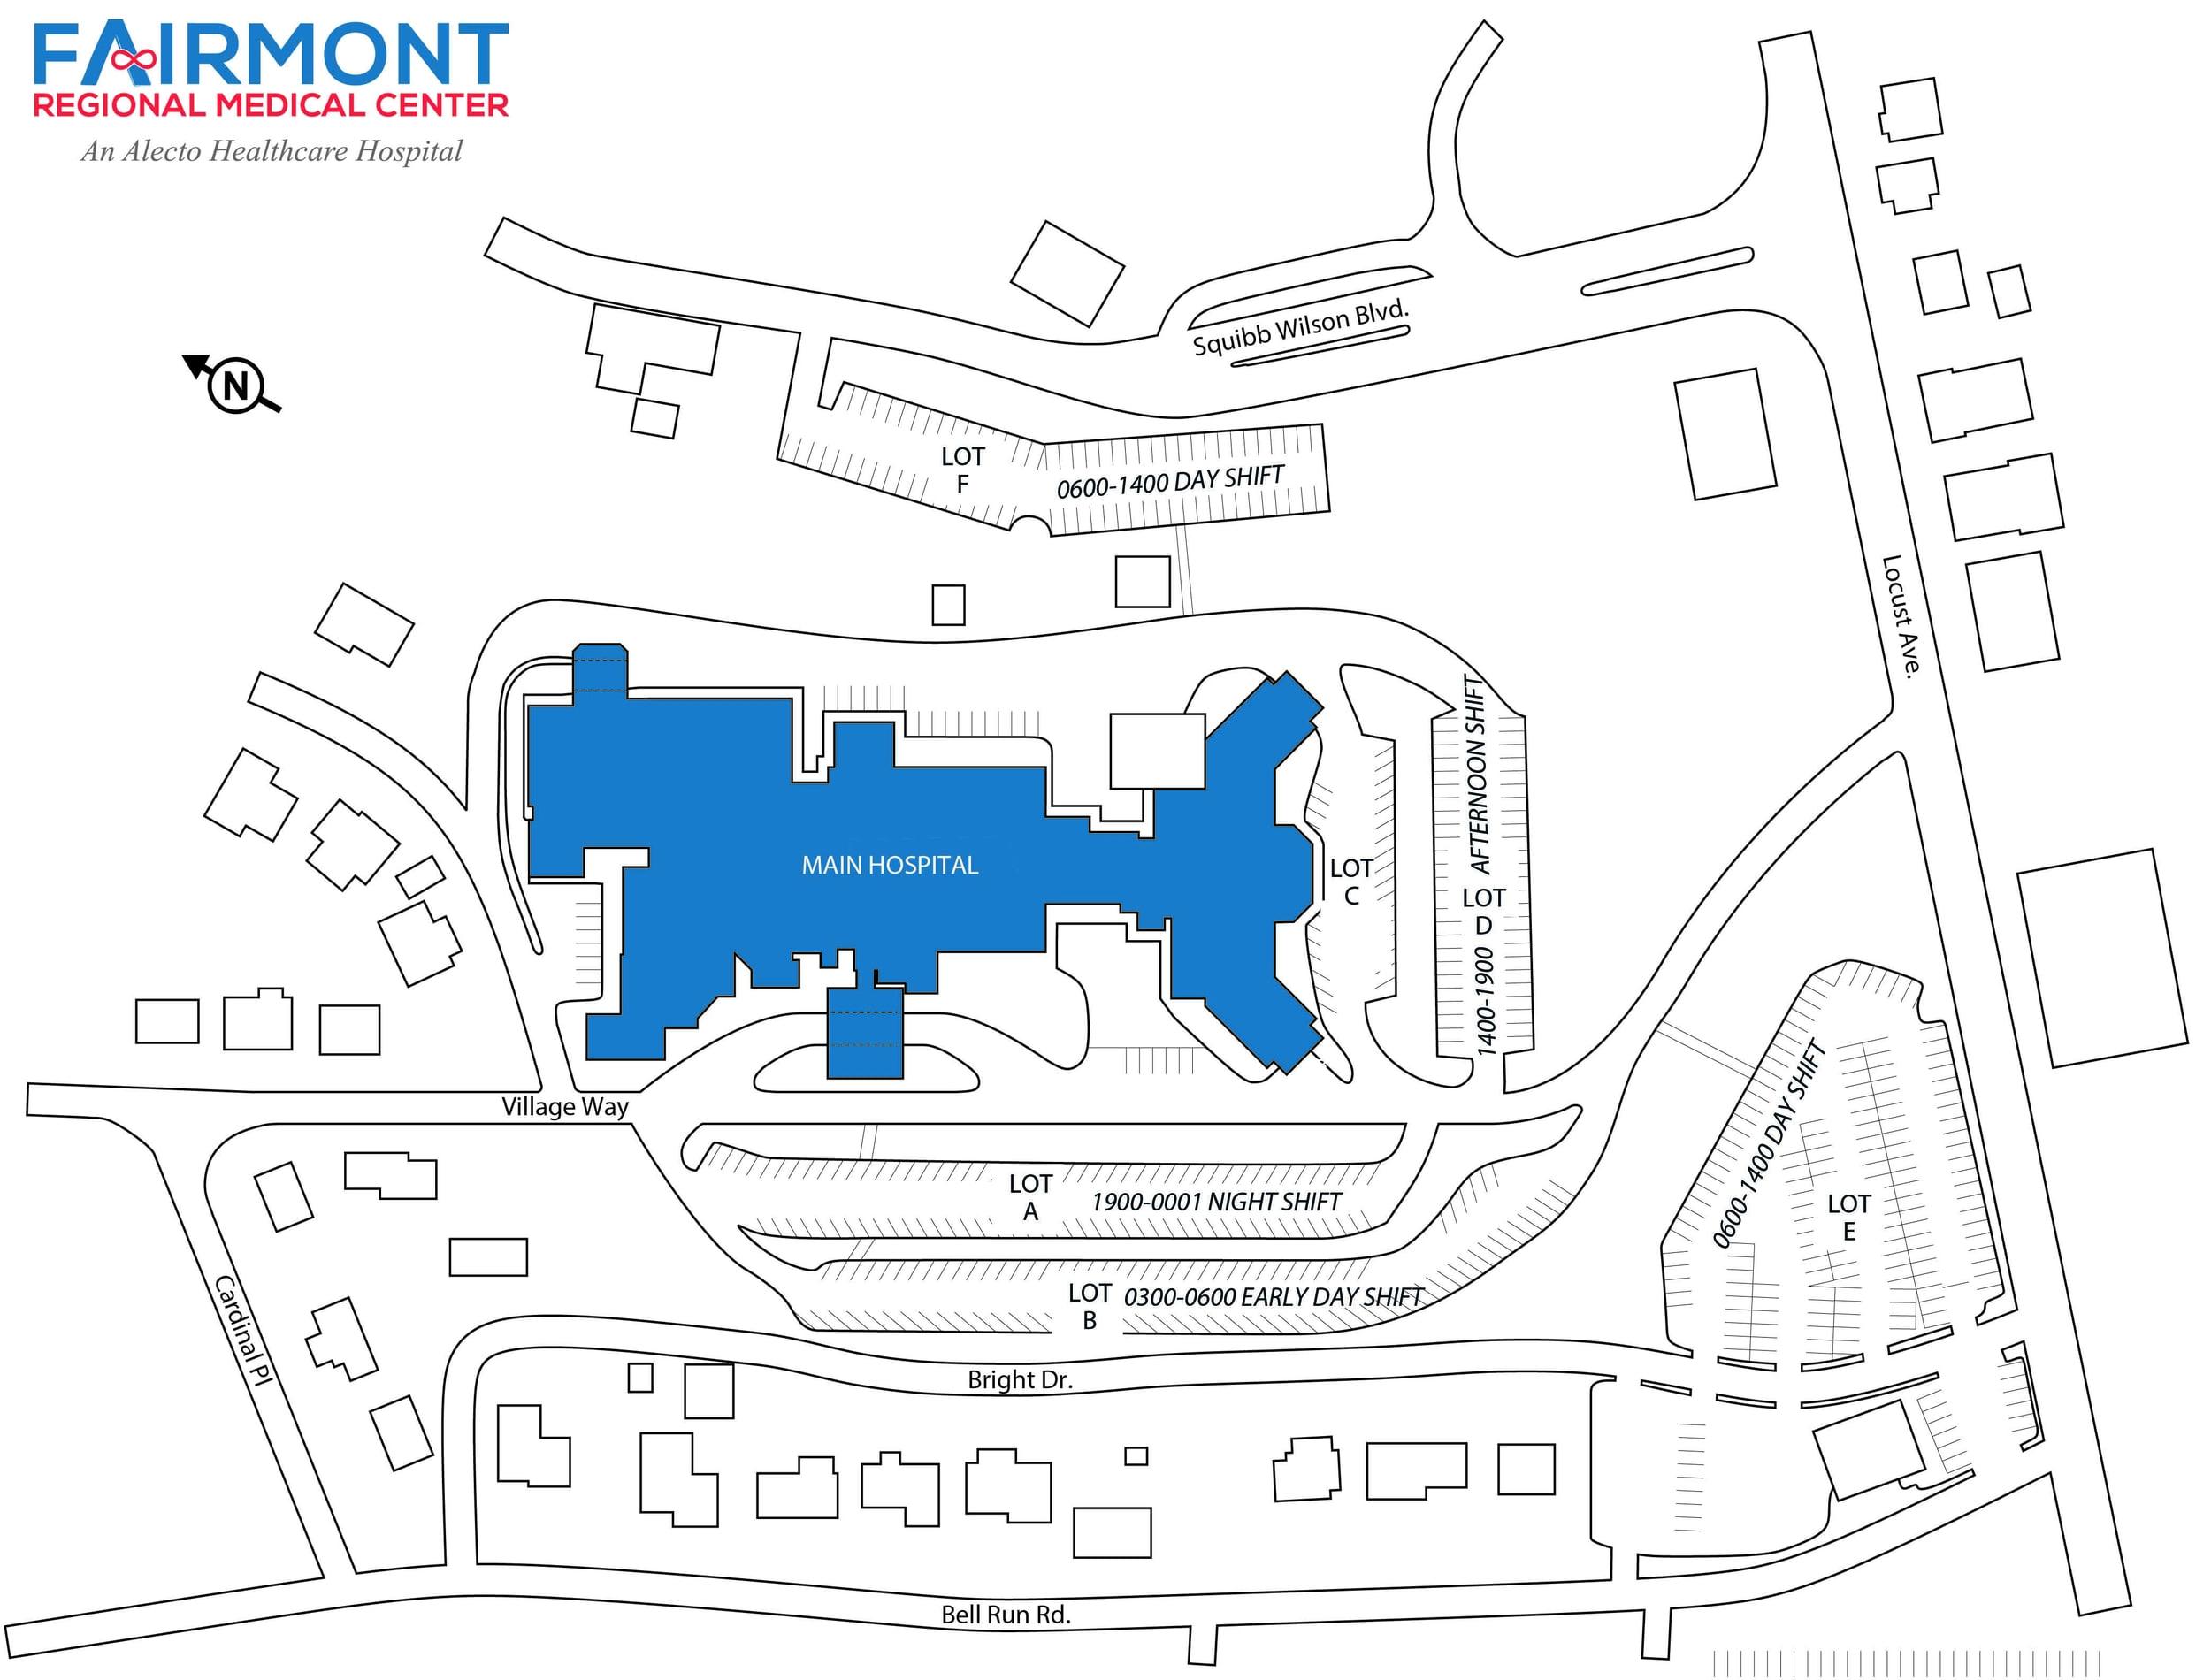 External Campus Map